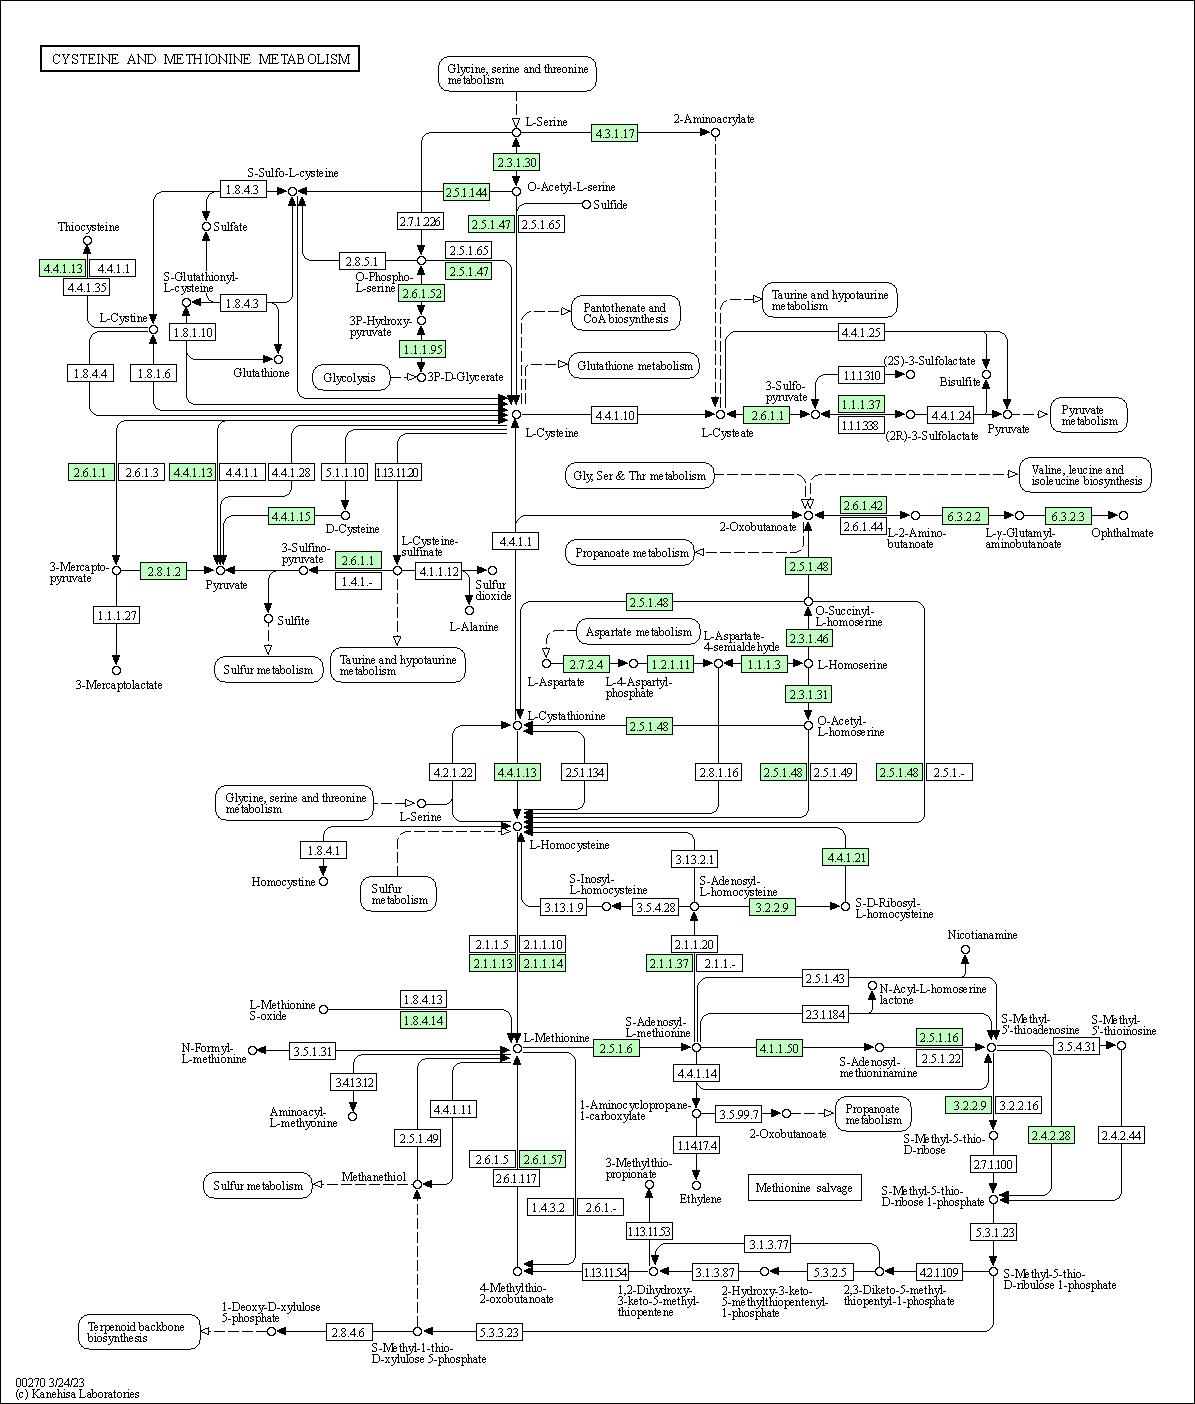 KEGG PATHWAY: Cysteine and methionine metabolism - Shigella